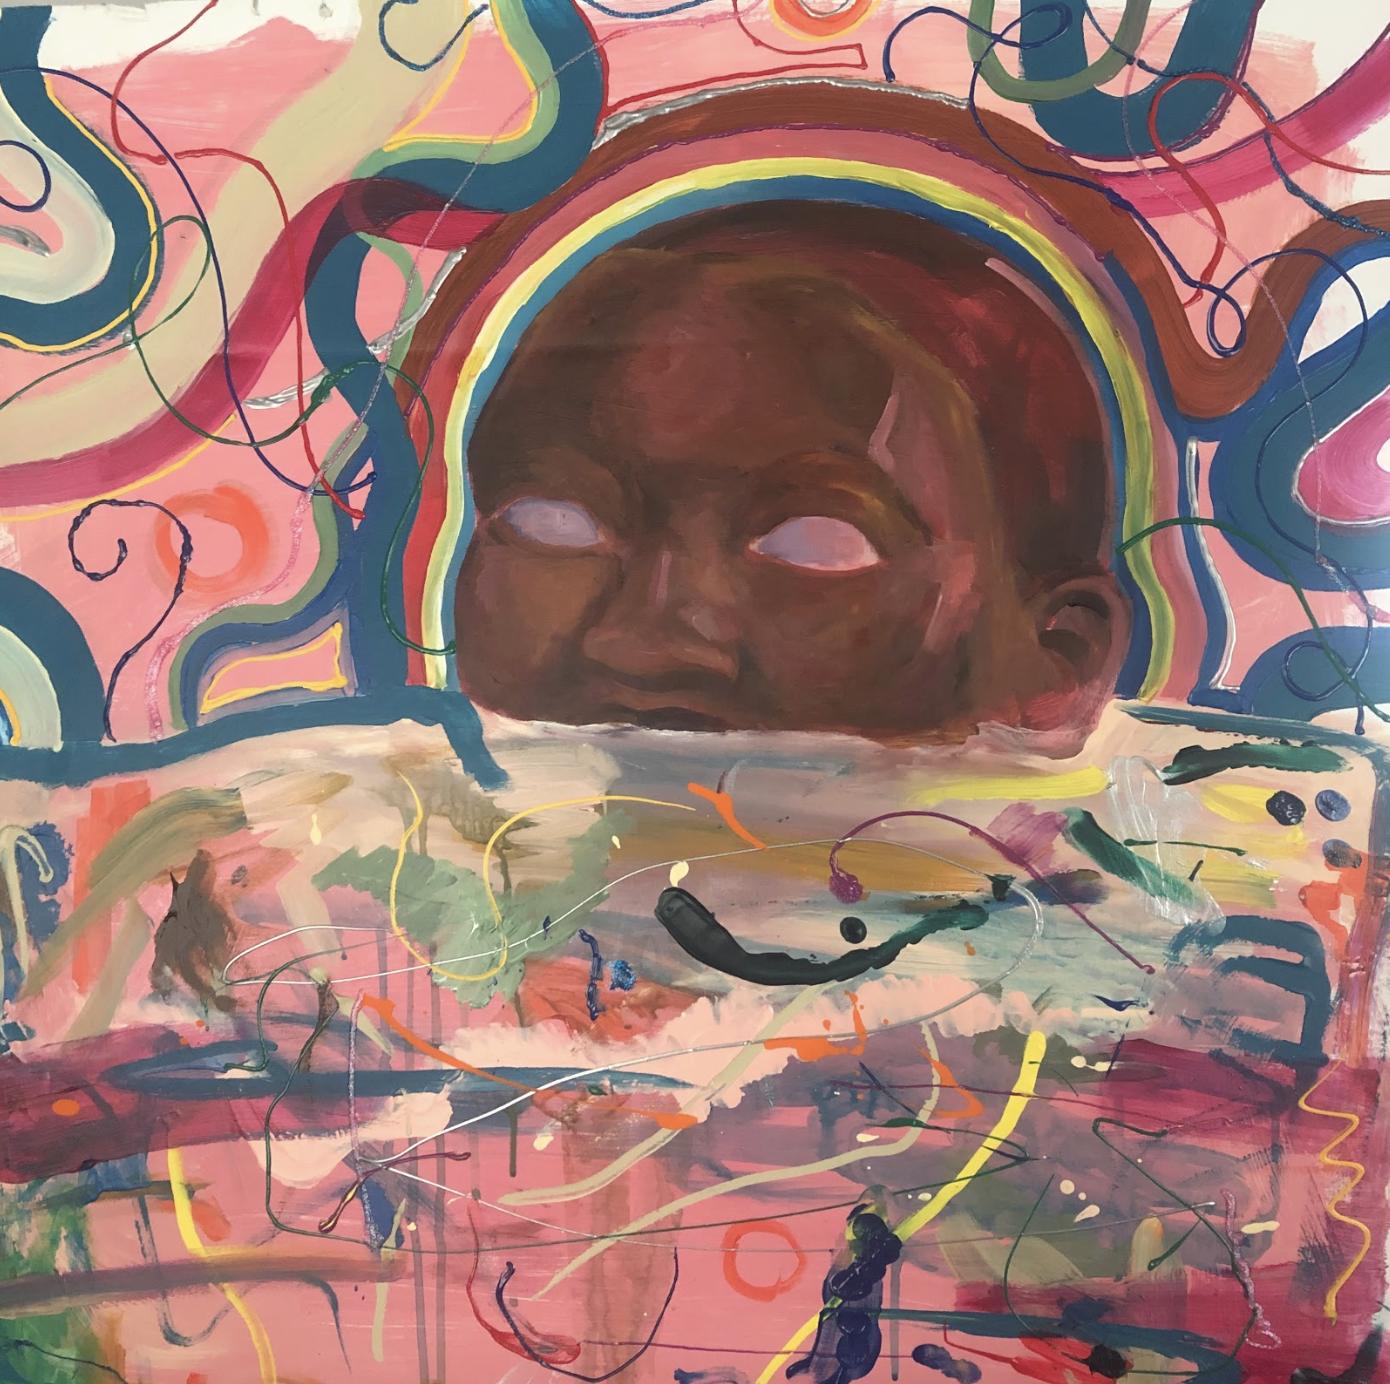 Gallery+of+students%27+quarantine+artwork